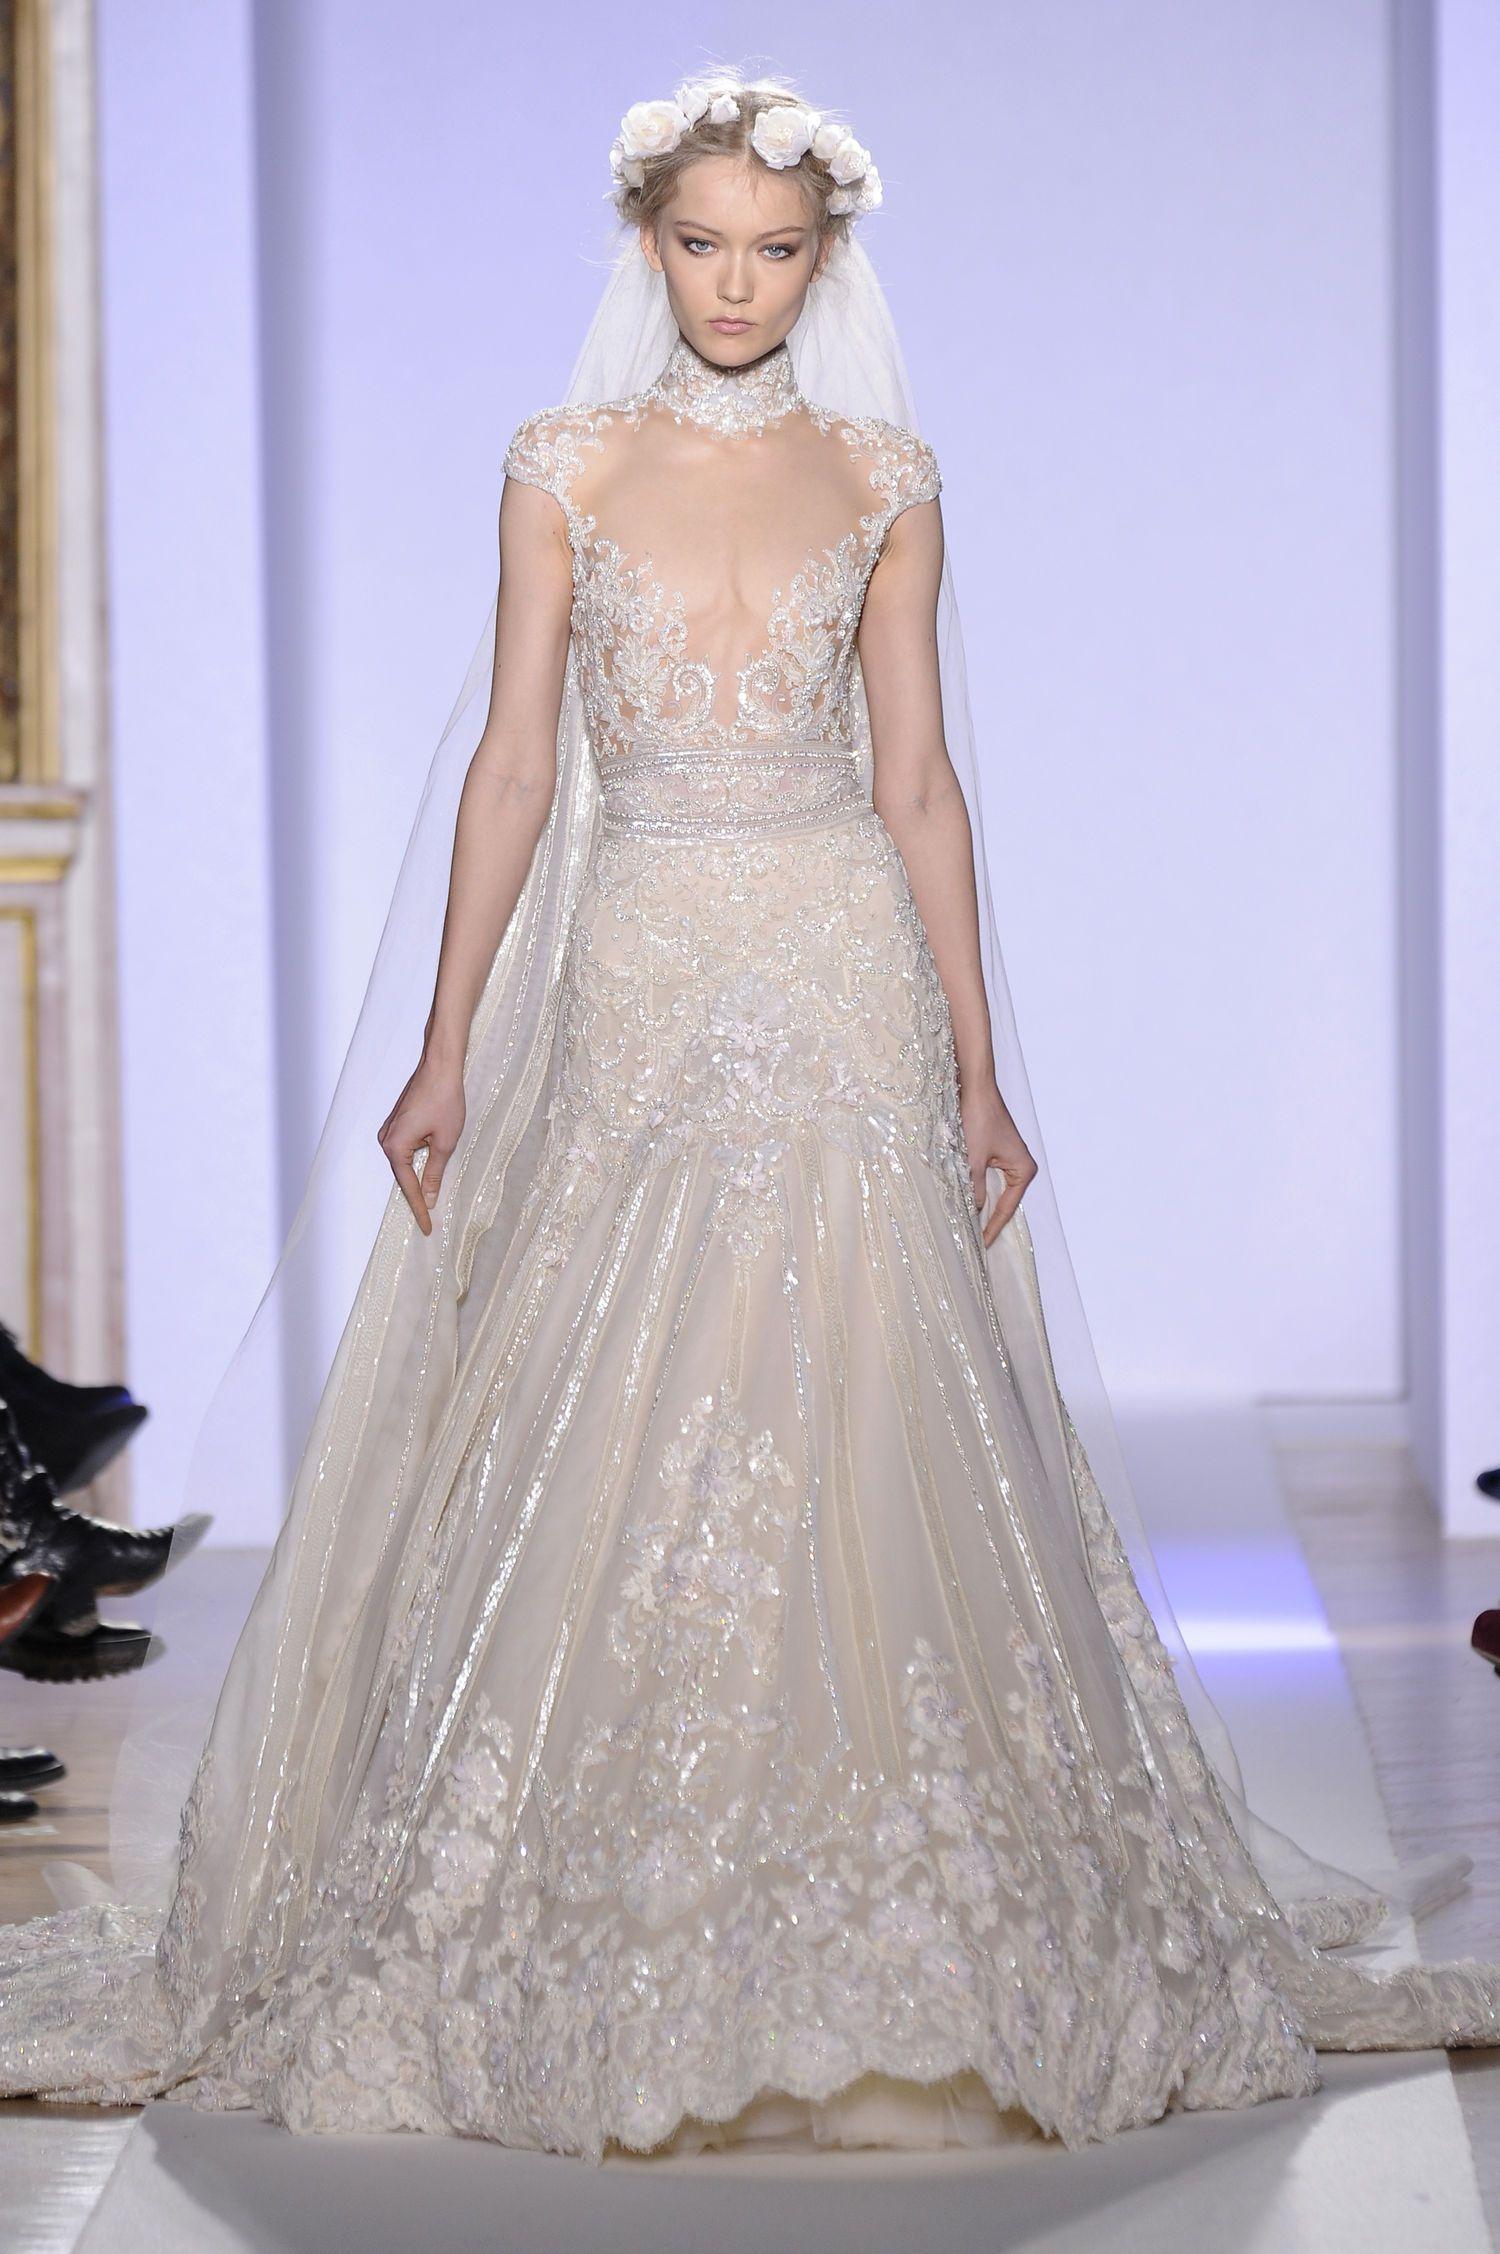 Prada Bridal Couture Wedding Dress Couture Couture Wedding